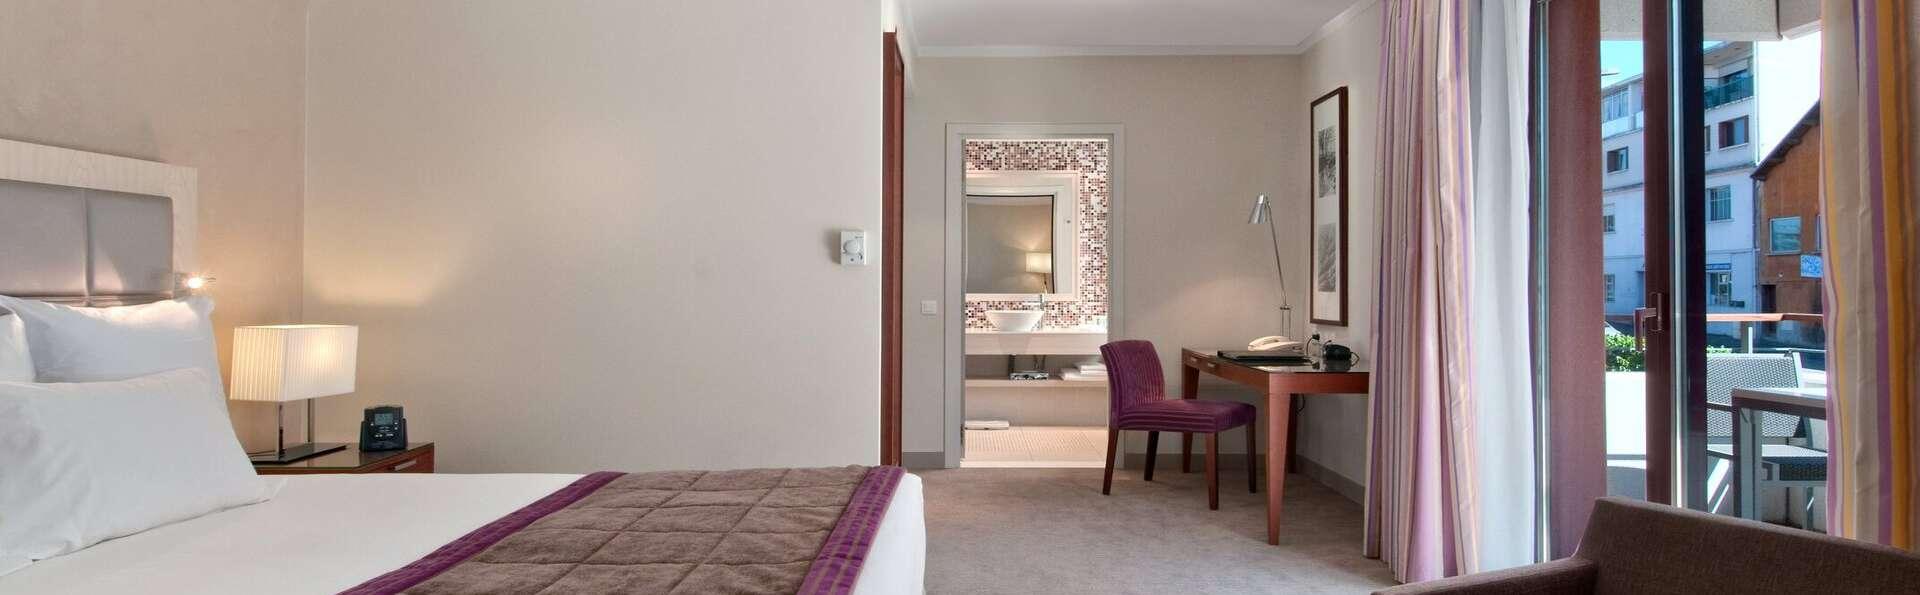 Hilton Évian les Bains - Standard.jpg